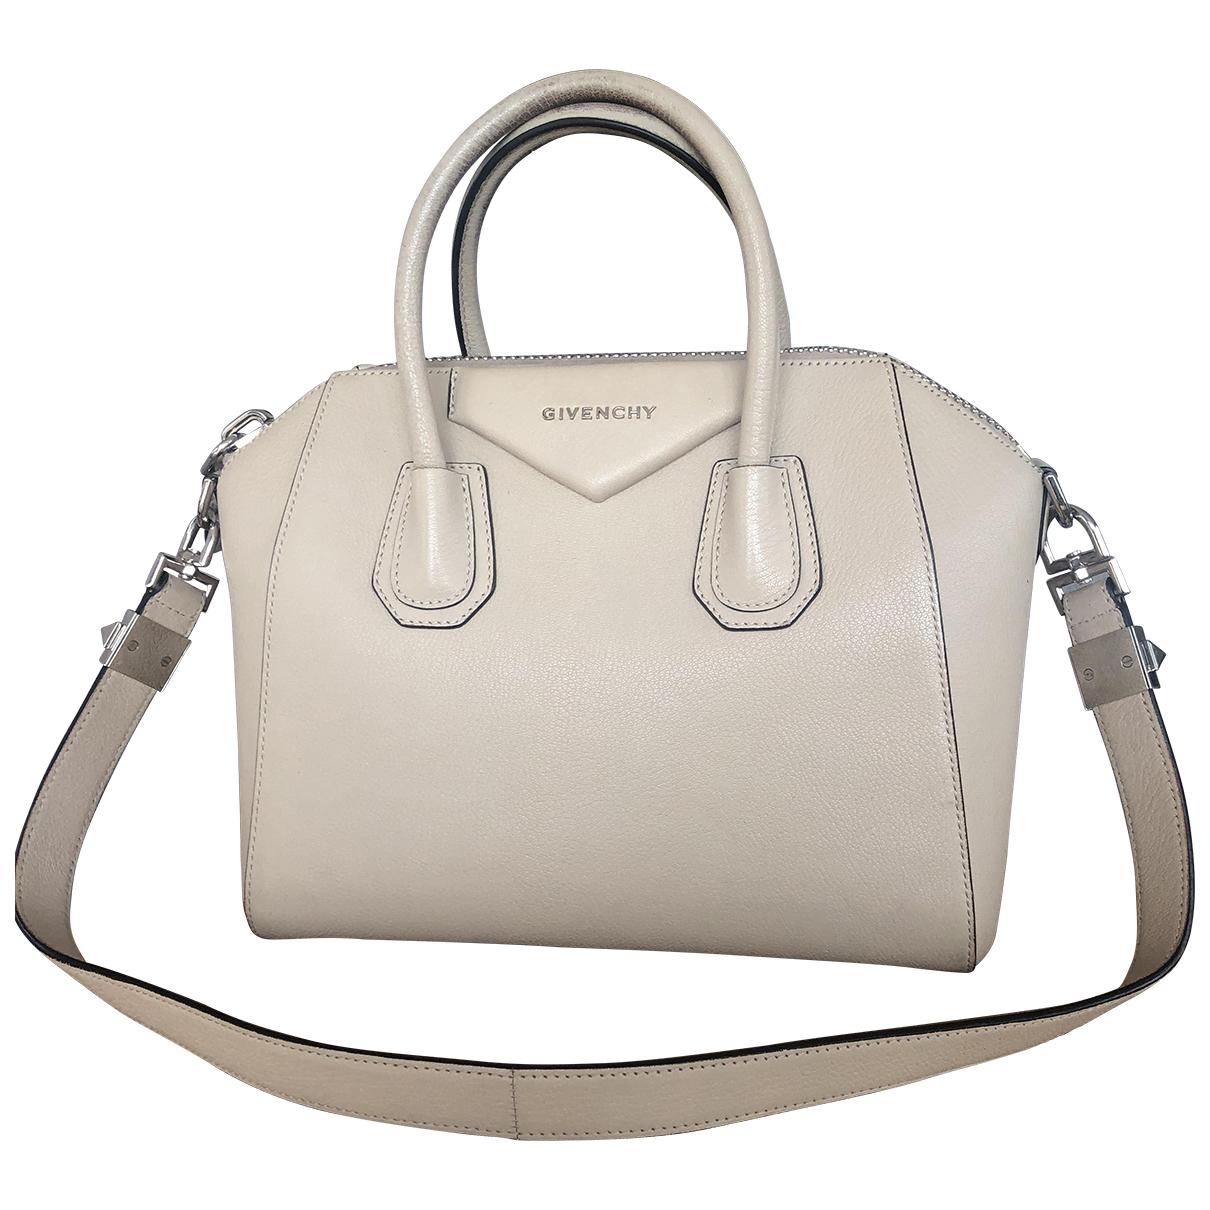 Givenchy - Sac a main Antigona pour femme en cuir - ecru